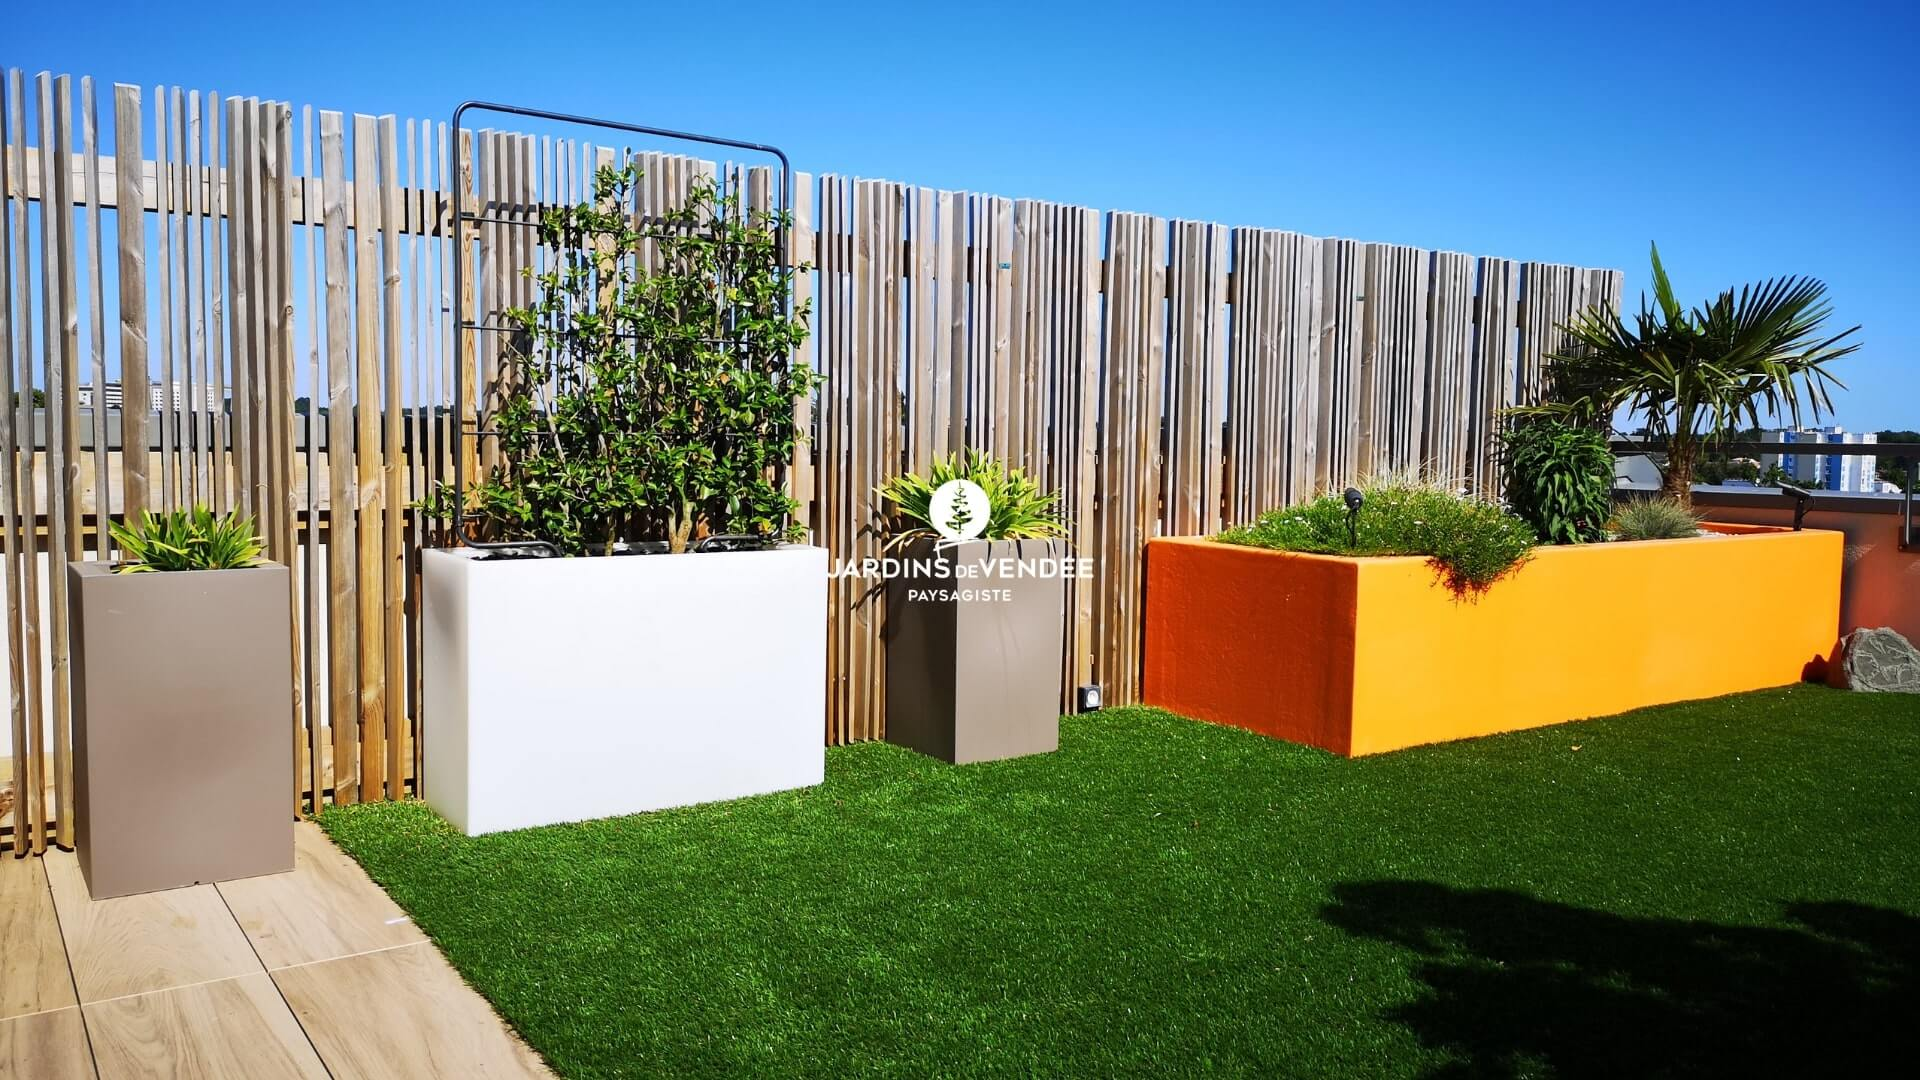 jardinsdevendee-realisations-amenagement-balcon(4)